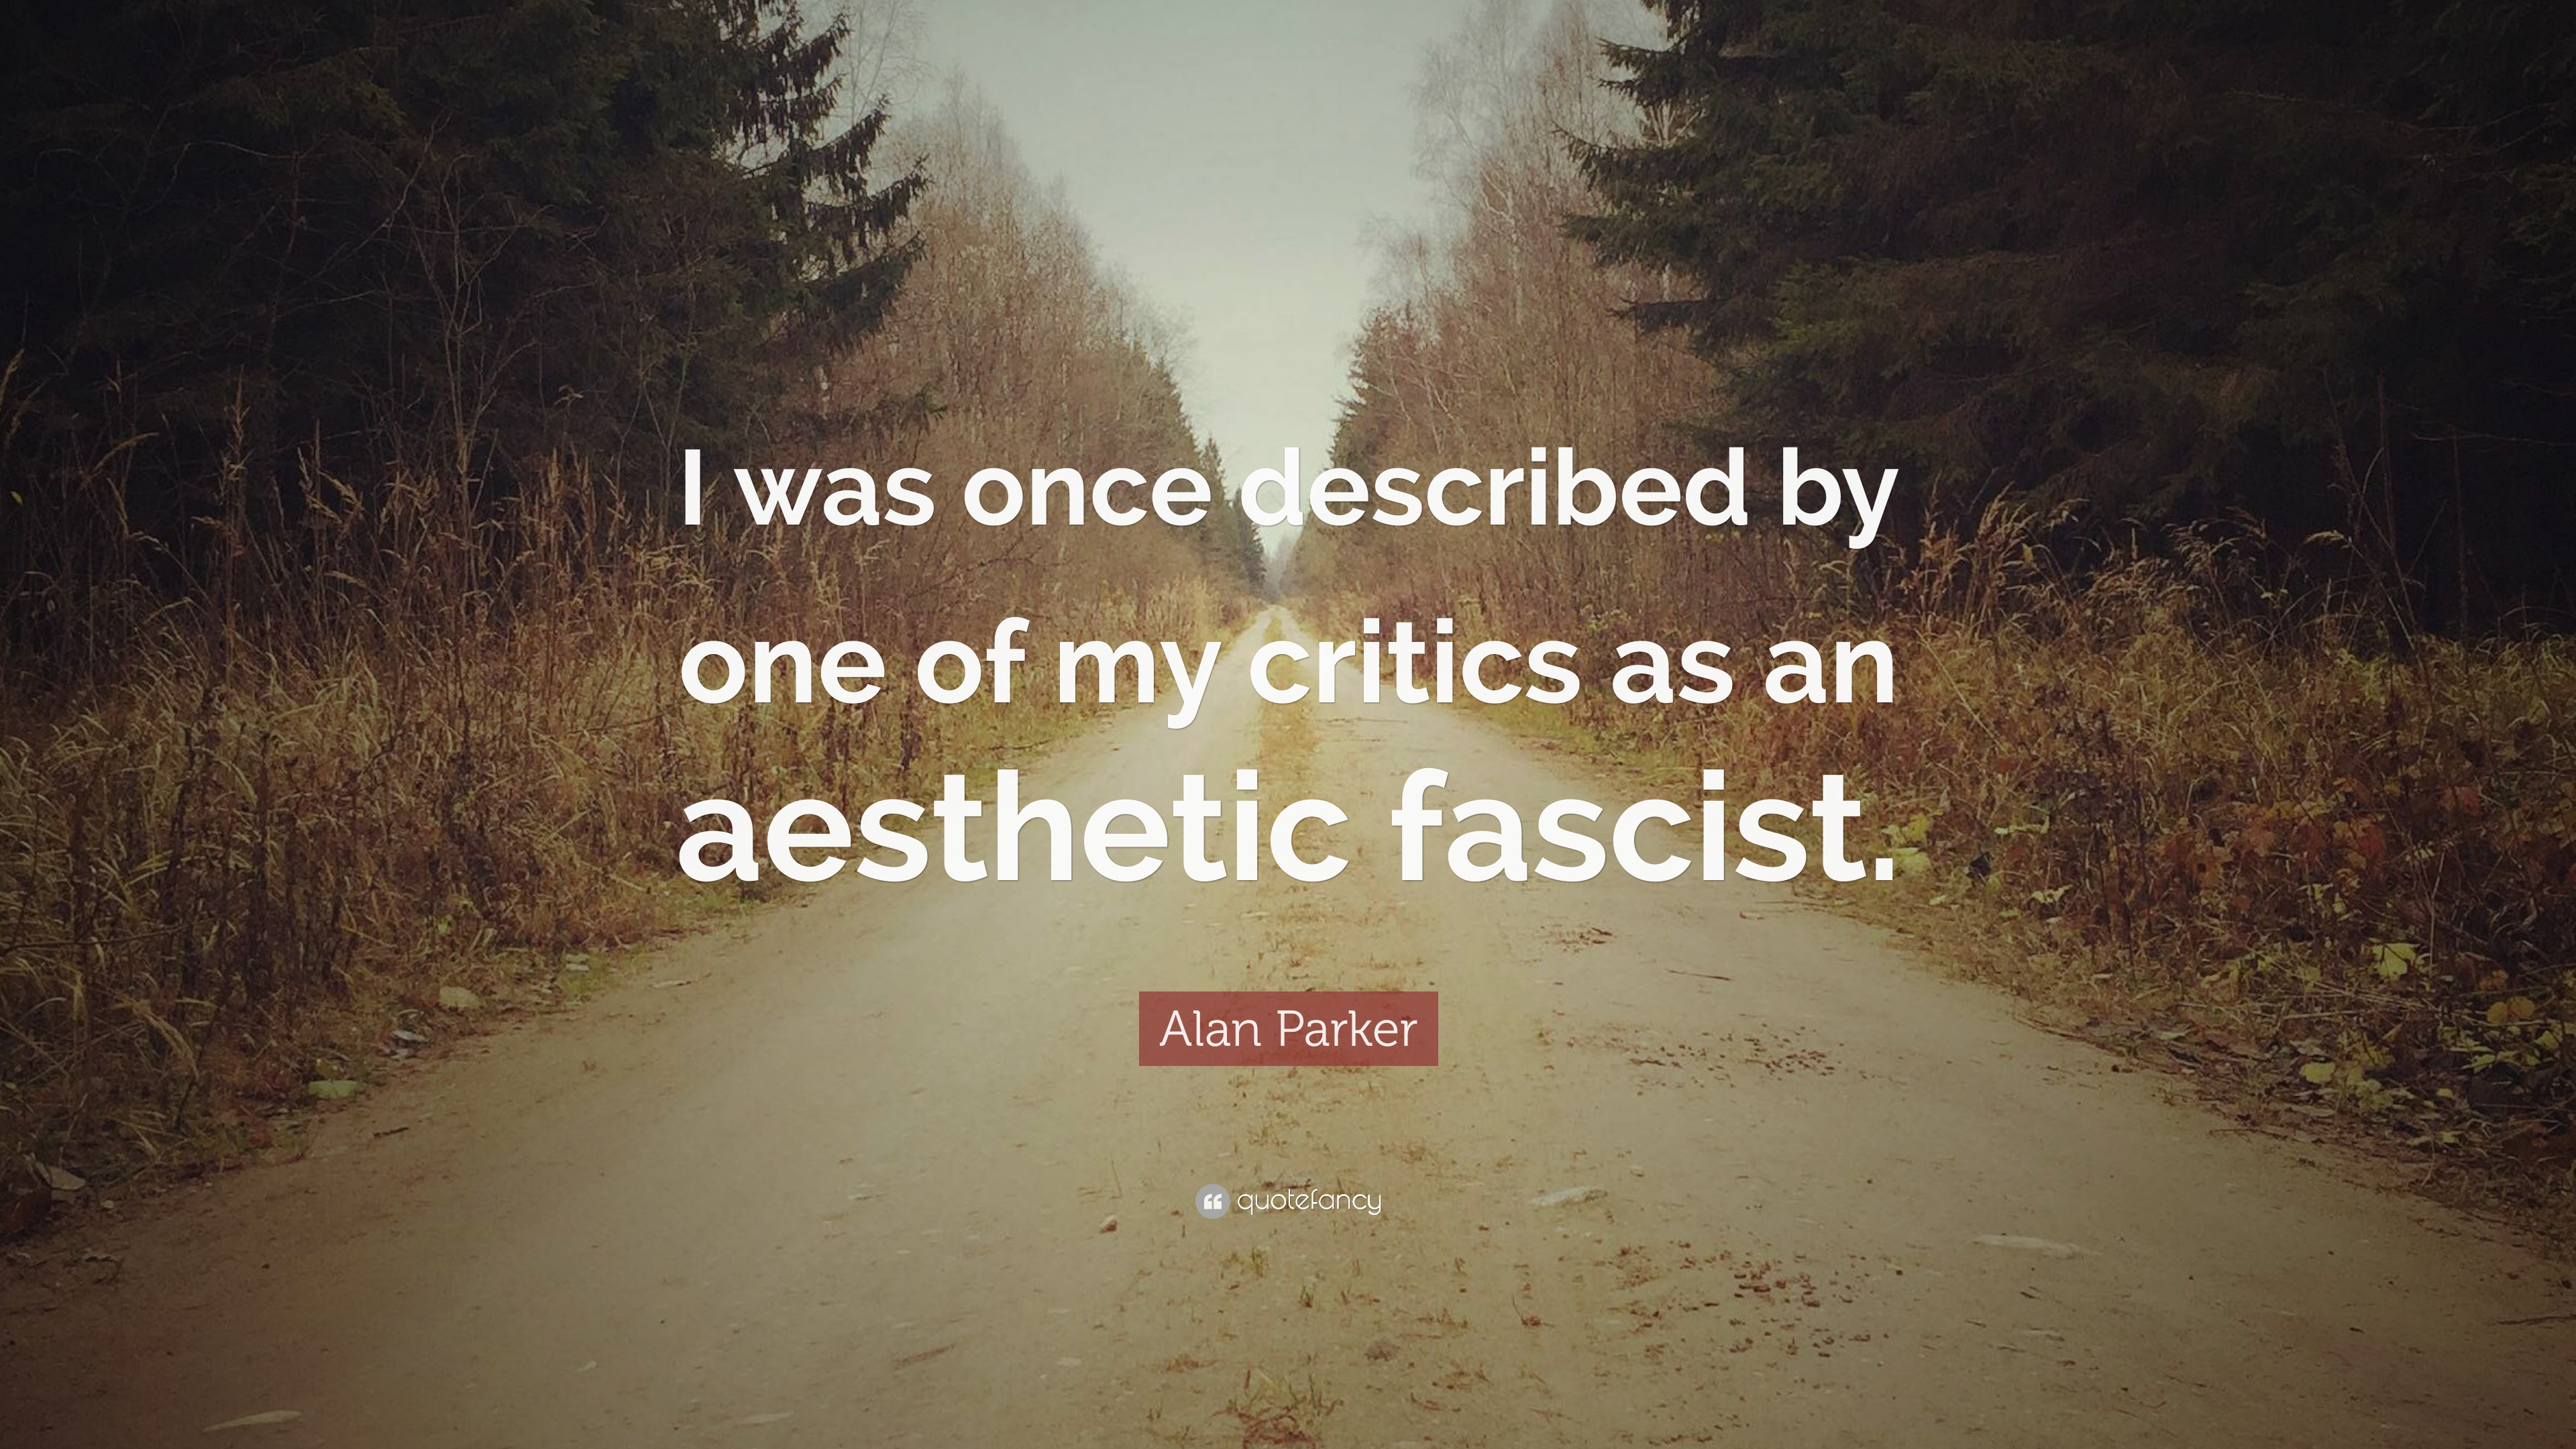 The aesthetes of fascism